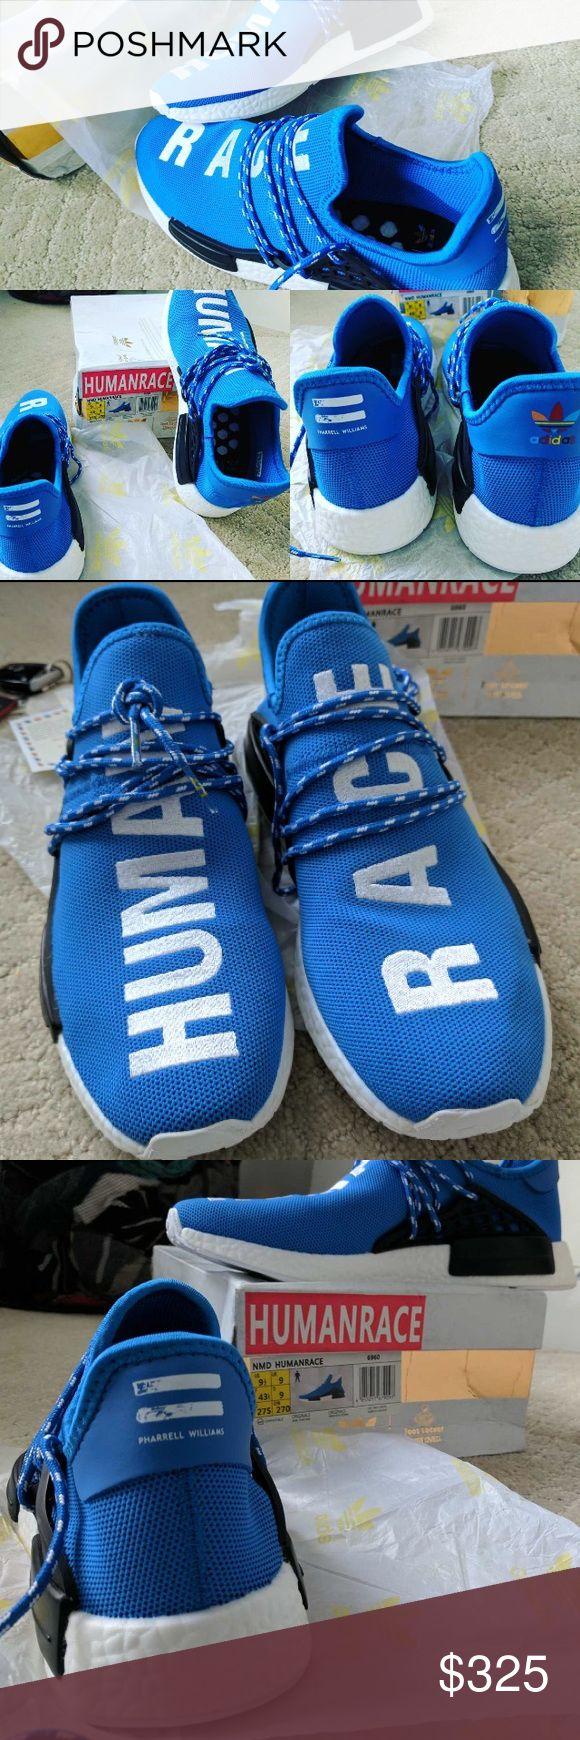 Pharrell X Cheap Adidas Nmd Human Race Red Urban Necessities